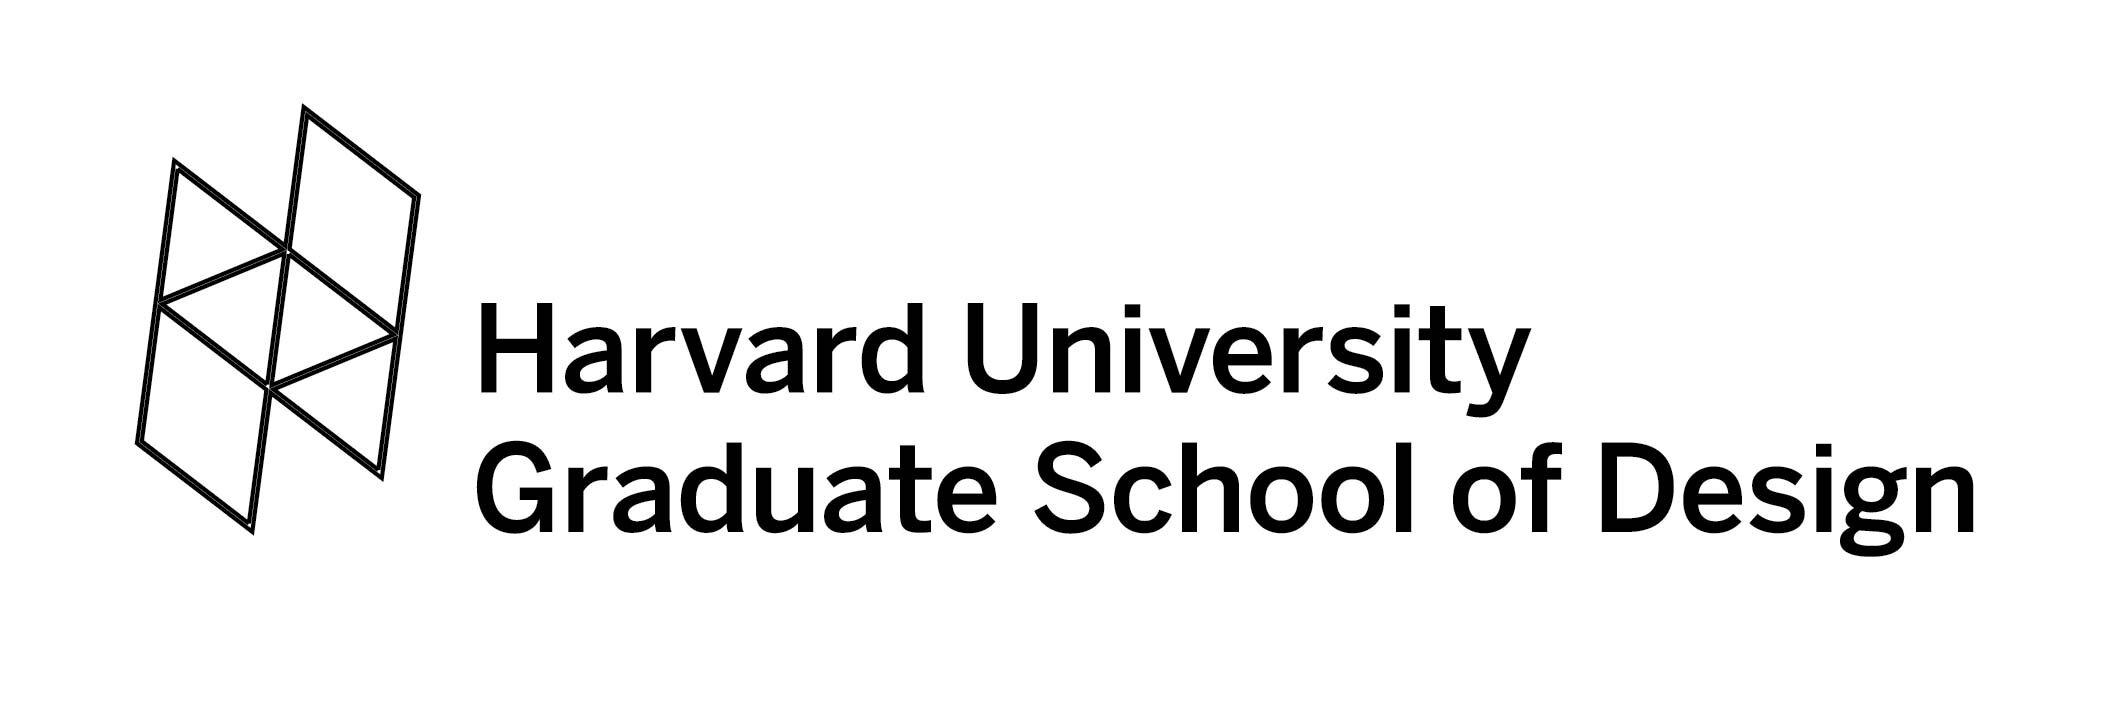 Harvard GSD-01.jpg